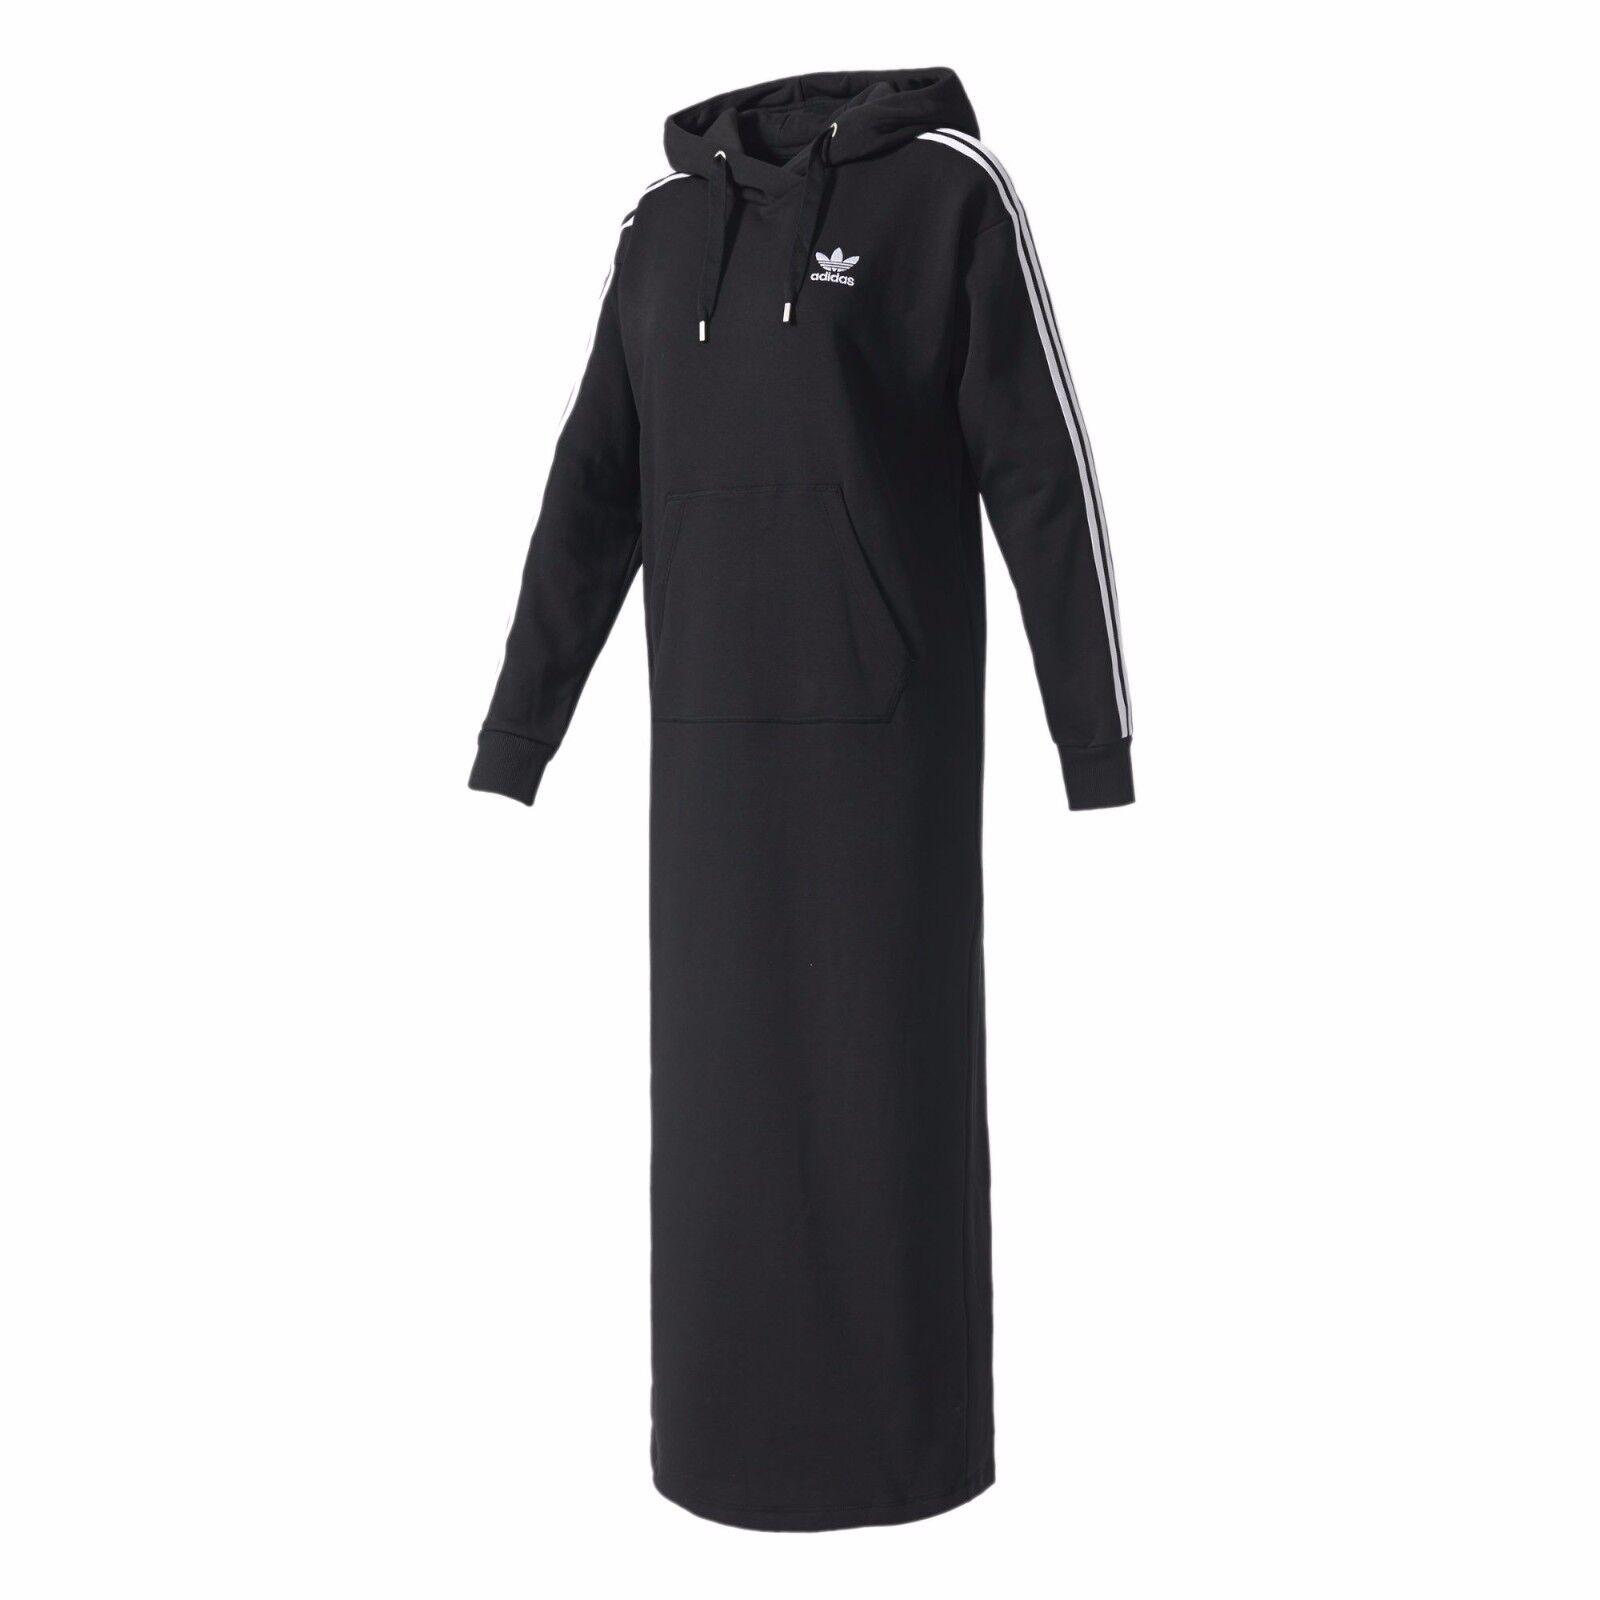 Xs 3 Originals S Black Long Dress Women Stripes M Maxi Adidas Hoodie vn0NOPym8w